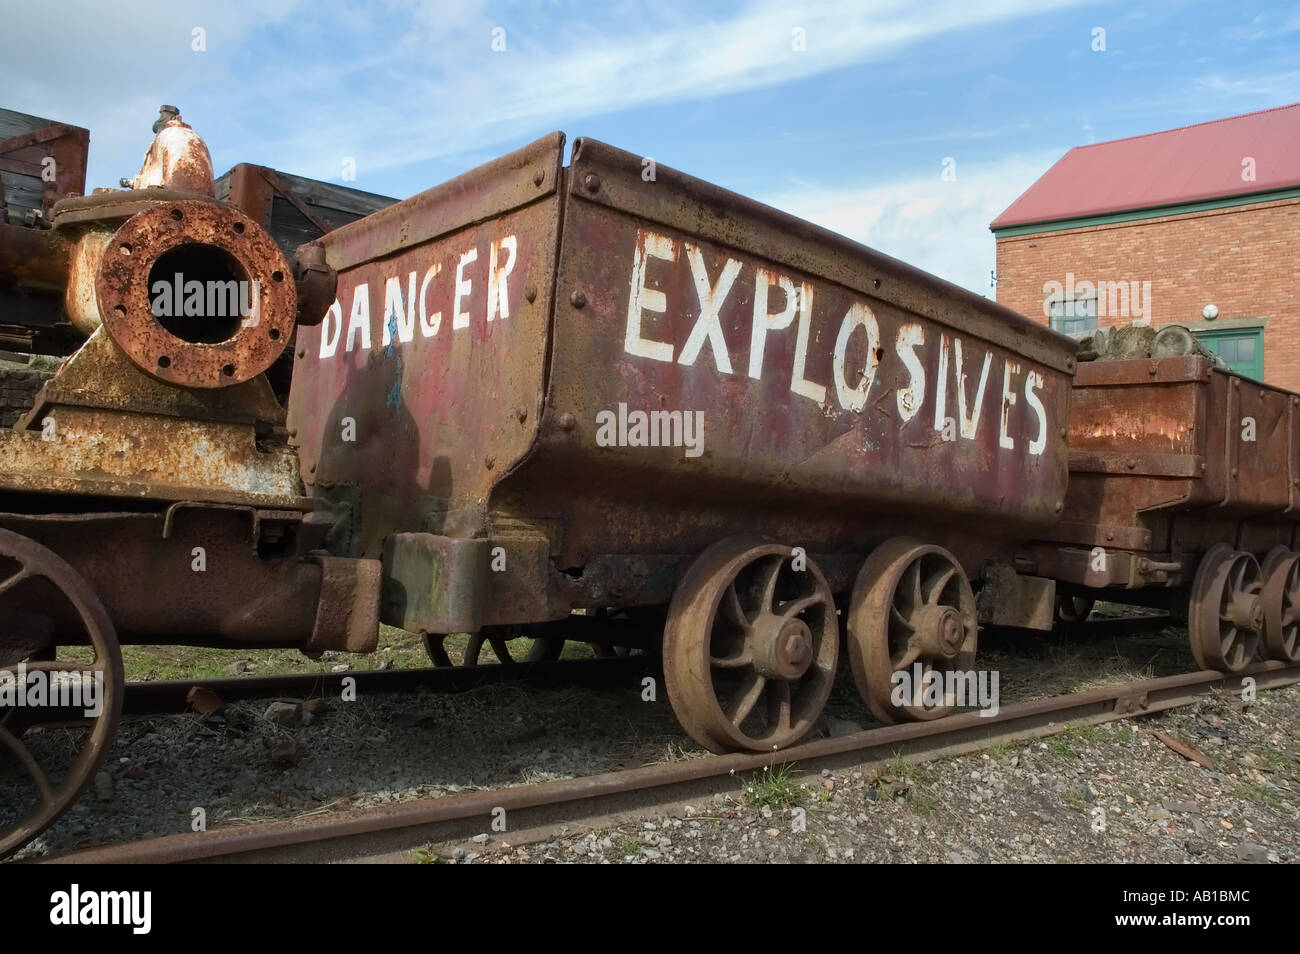 Explosives Wagon at Big Pit National Coal Museum, Blaenavon, South Wales UK - Stock Image